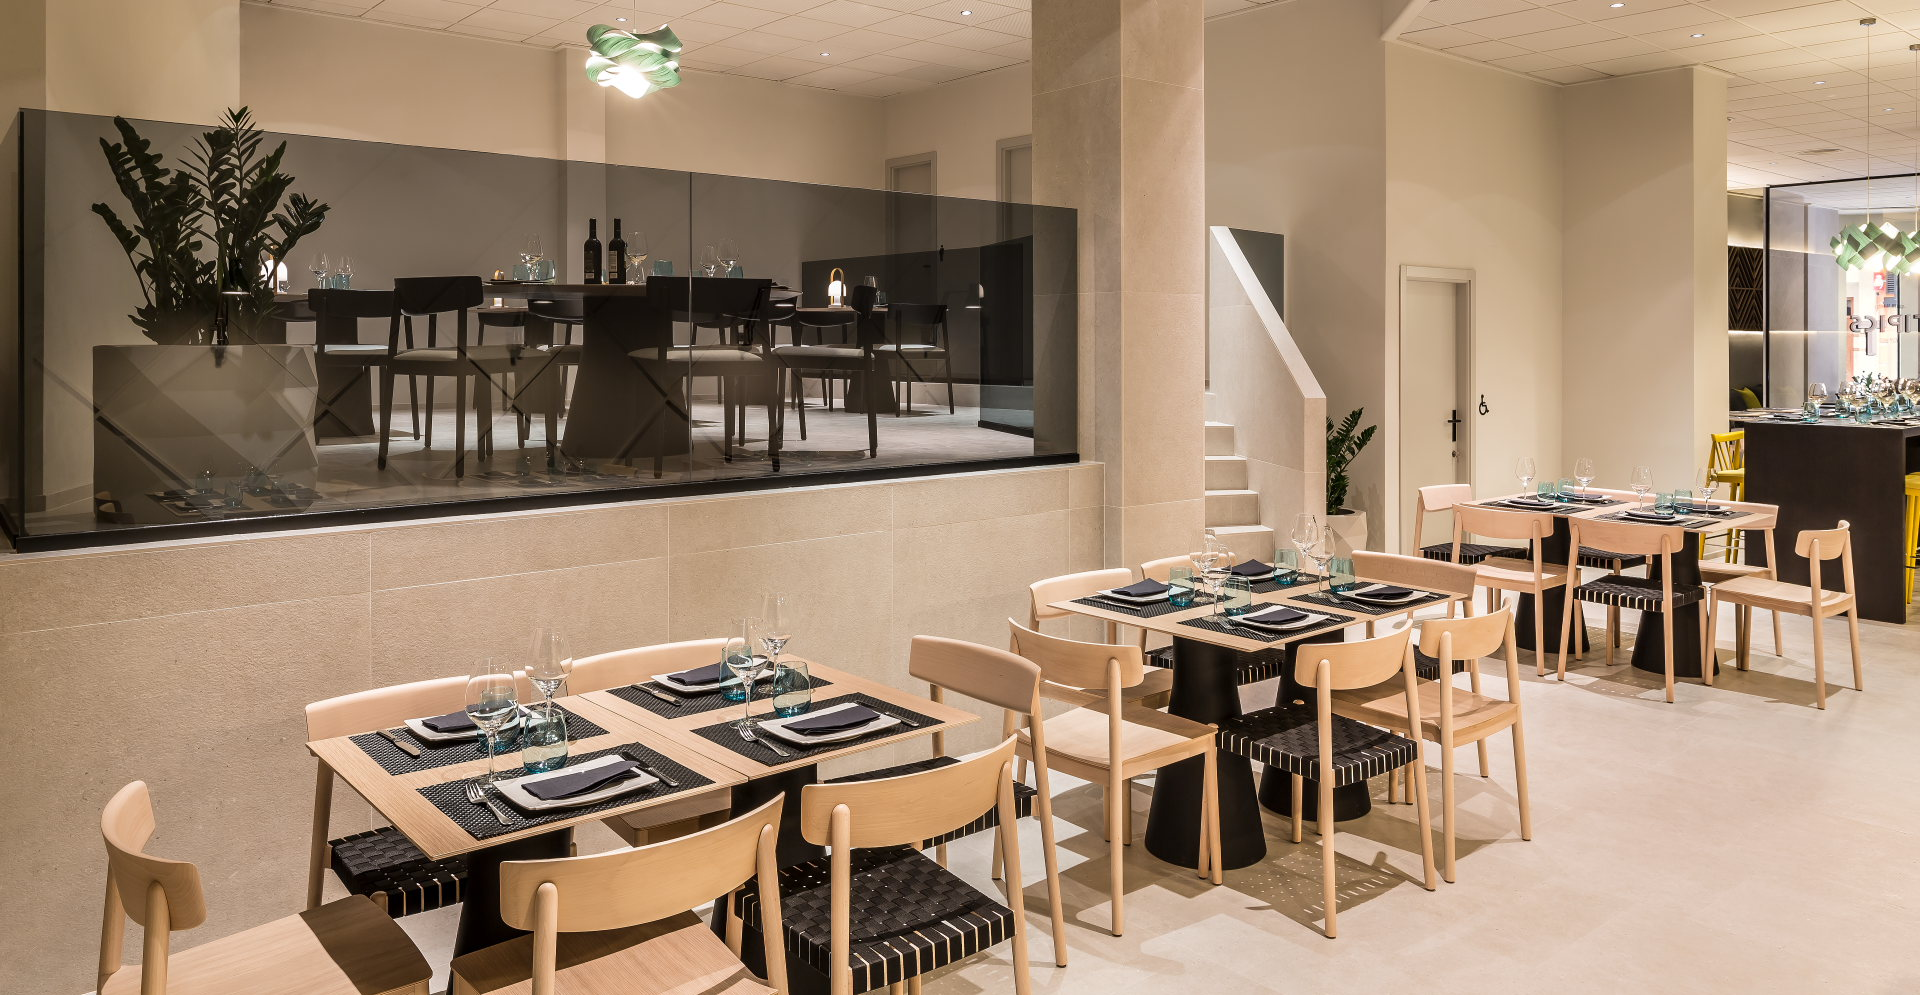 fotografia-arquitectura–interiorismo-valencia-german-cabo-estudihac-restaurante-tipics-xativa (25)